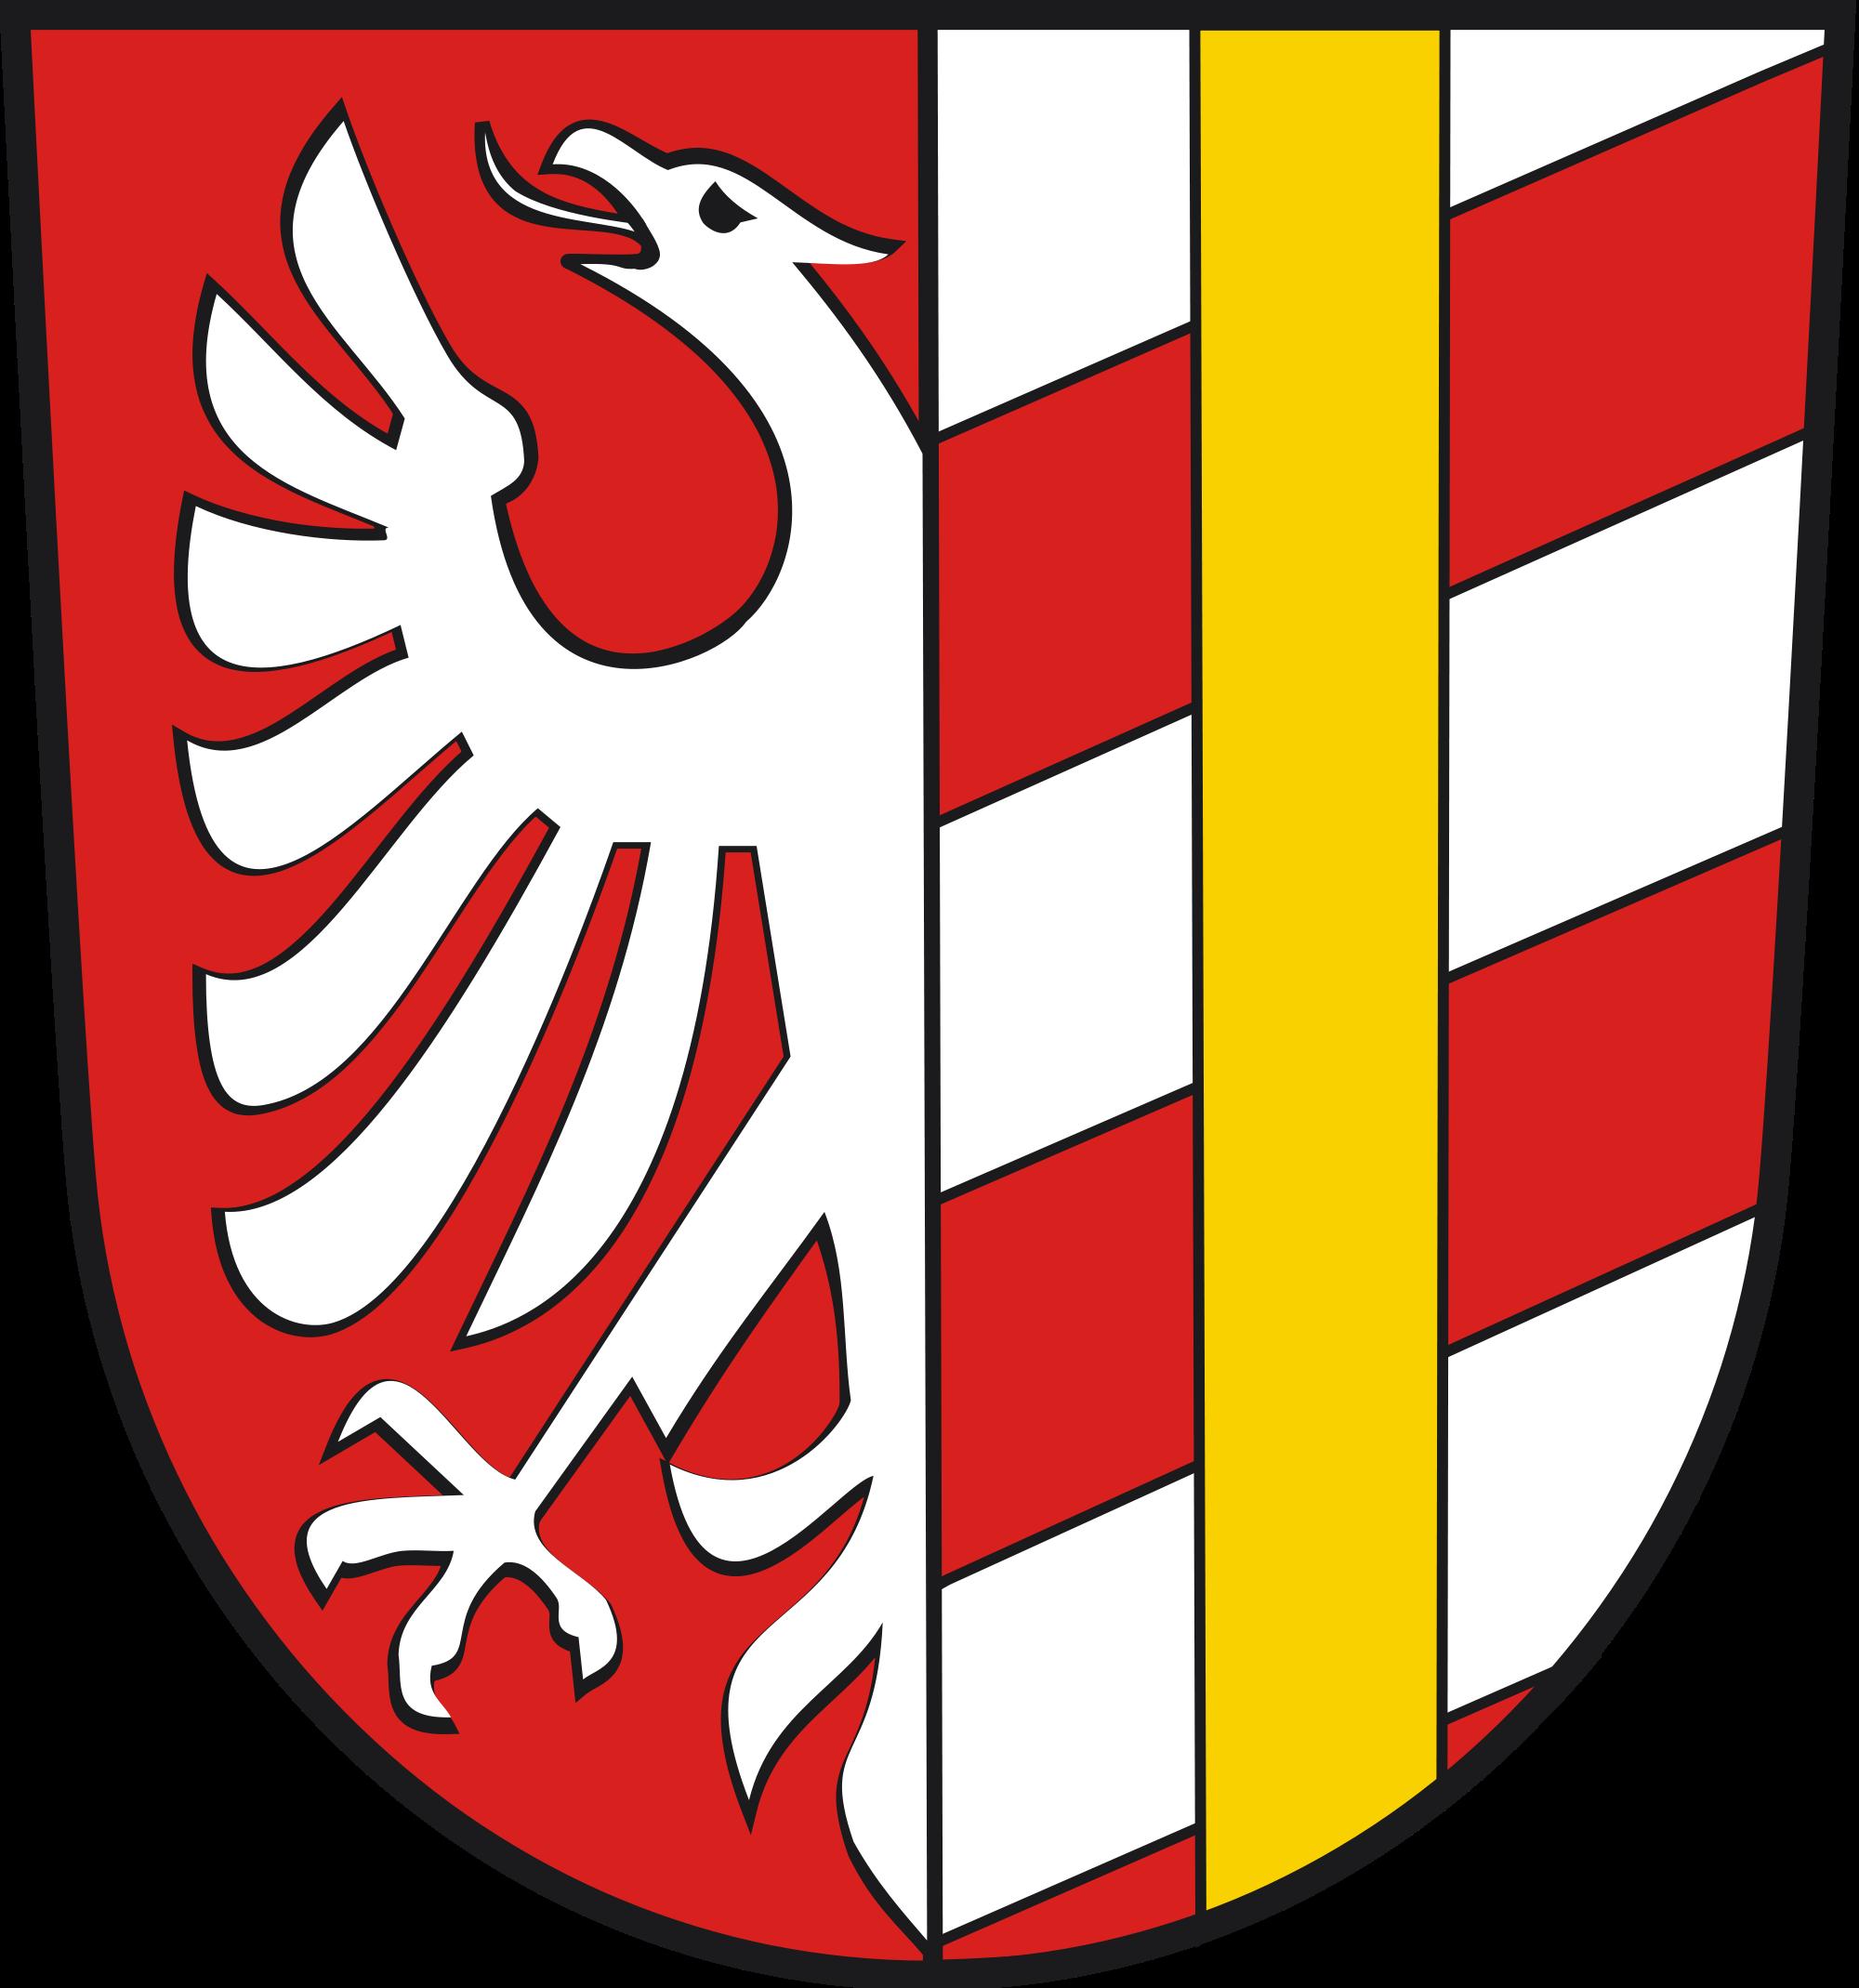 File:Wappen Landkreis Guenzburg.svg.